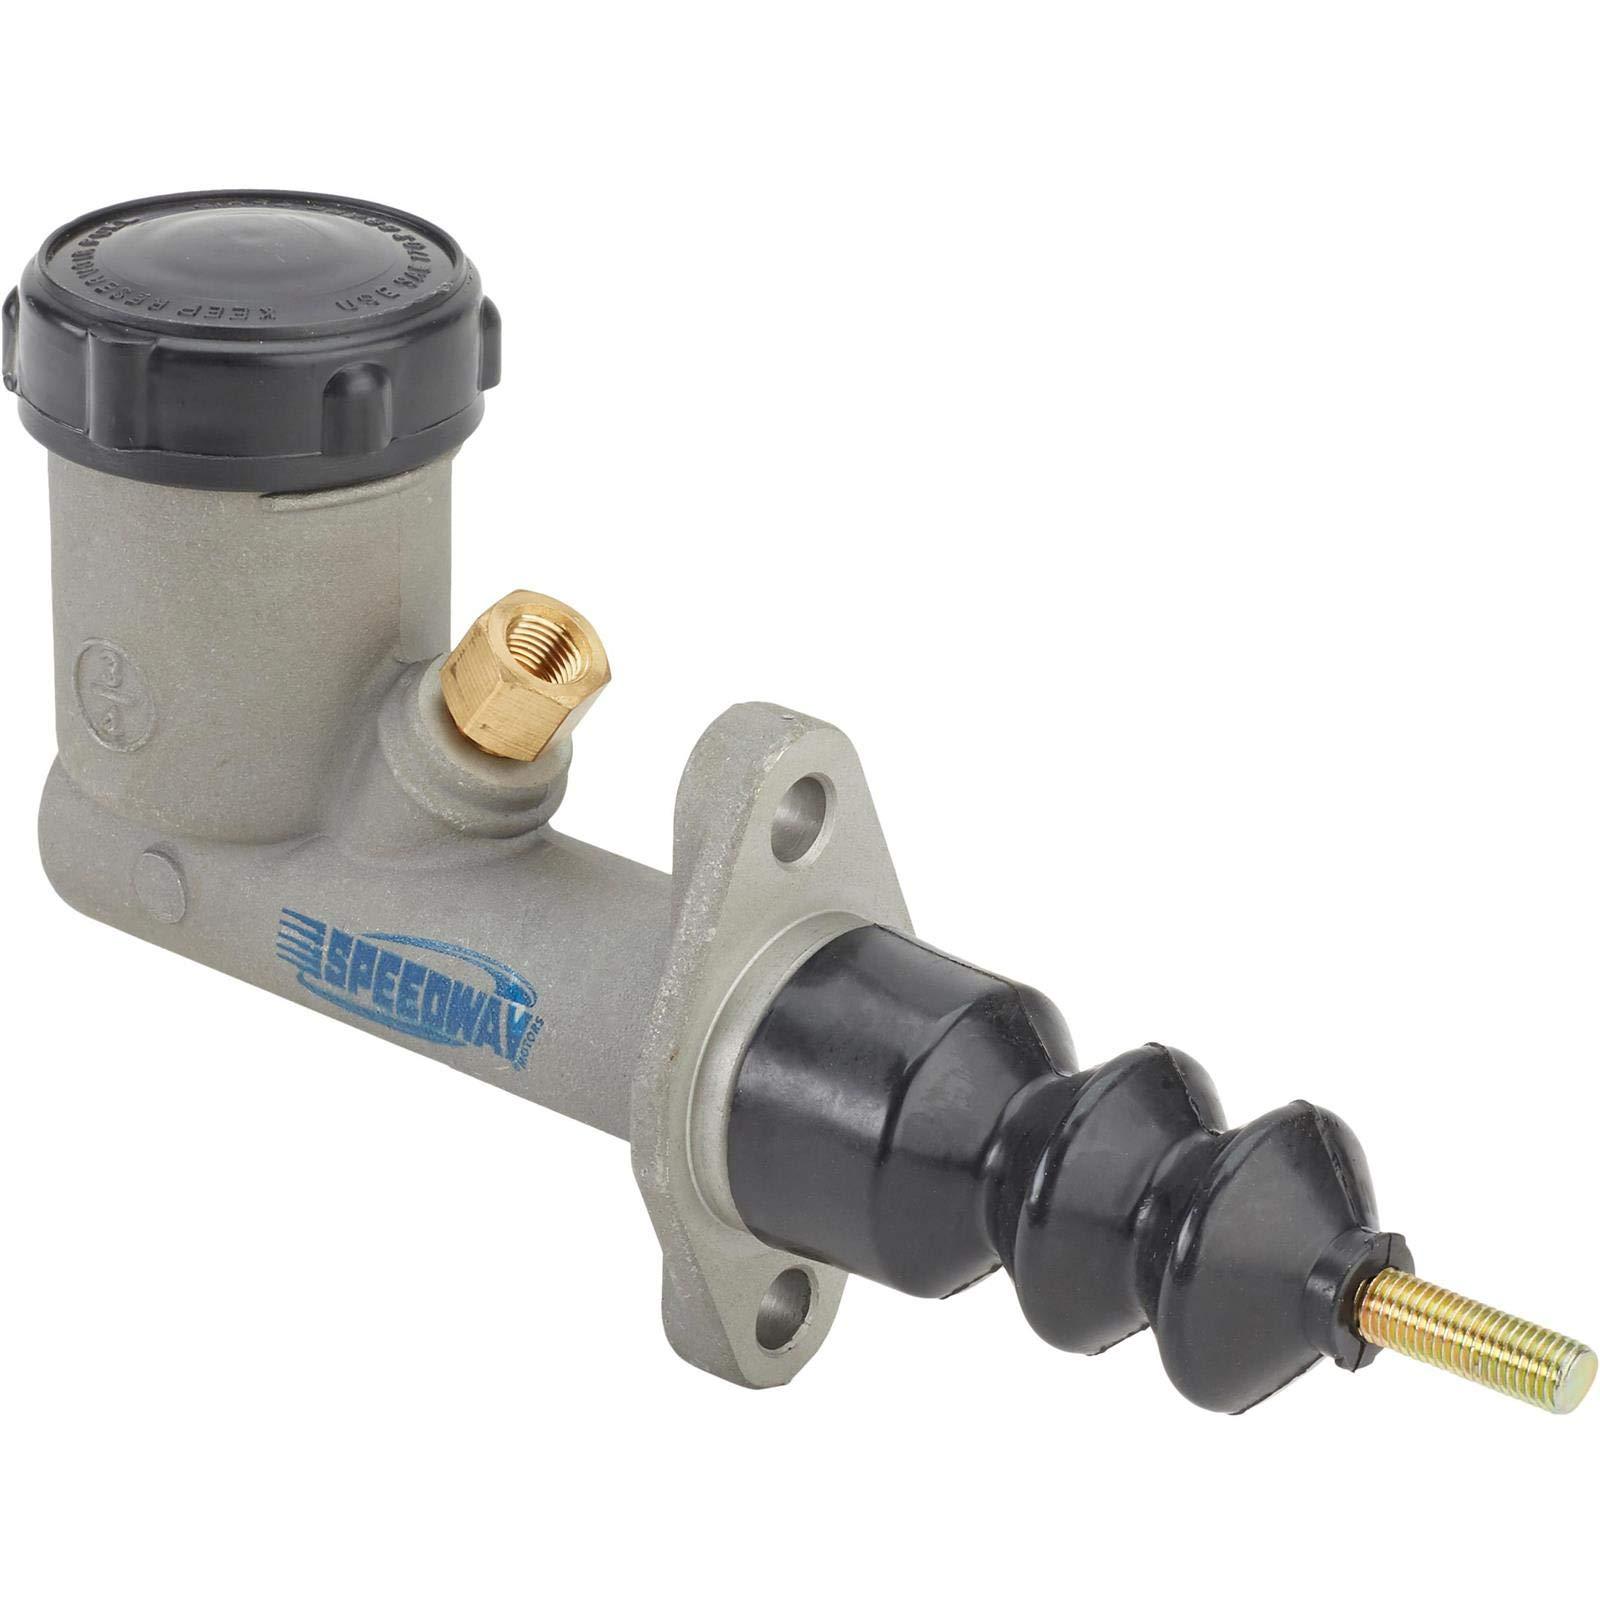 Clutch Master Cylinder - 3/4 Bore